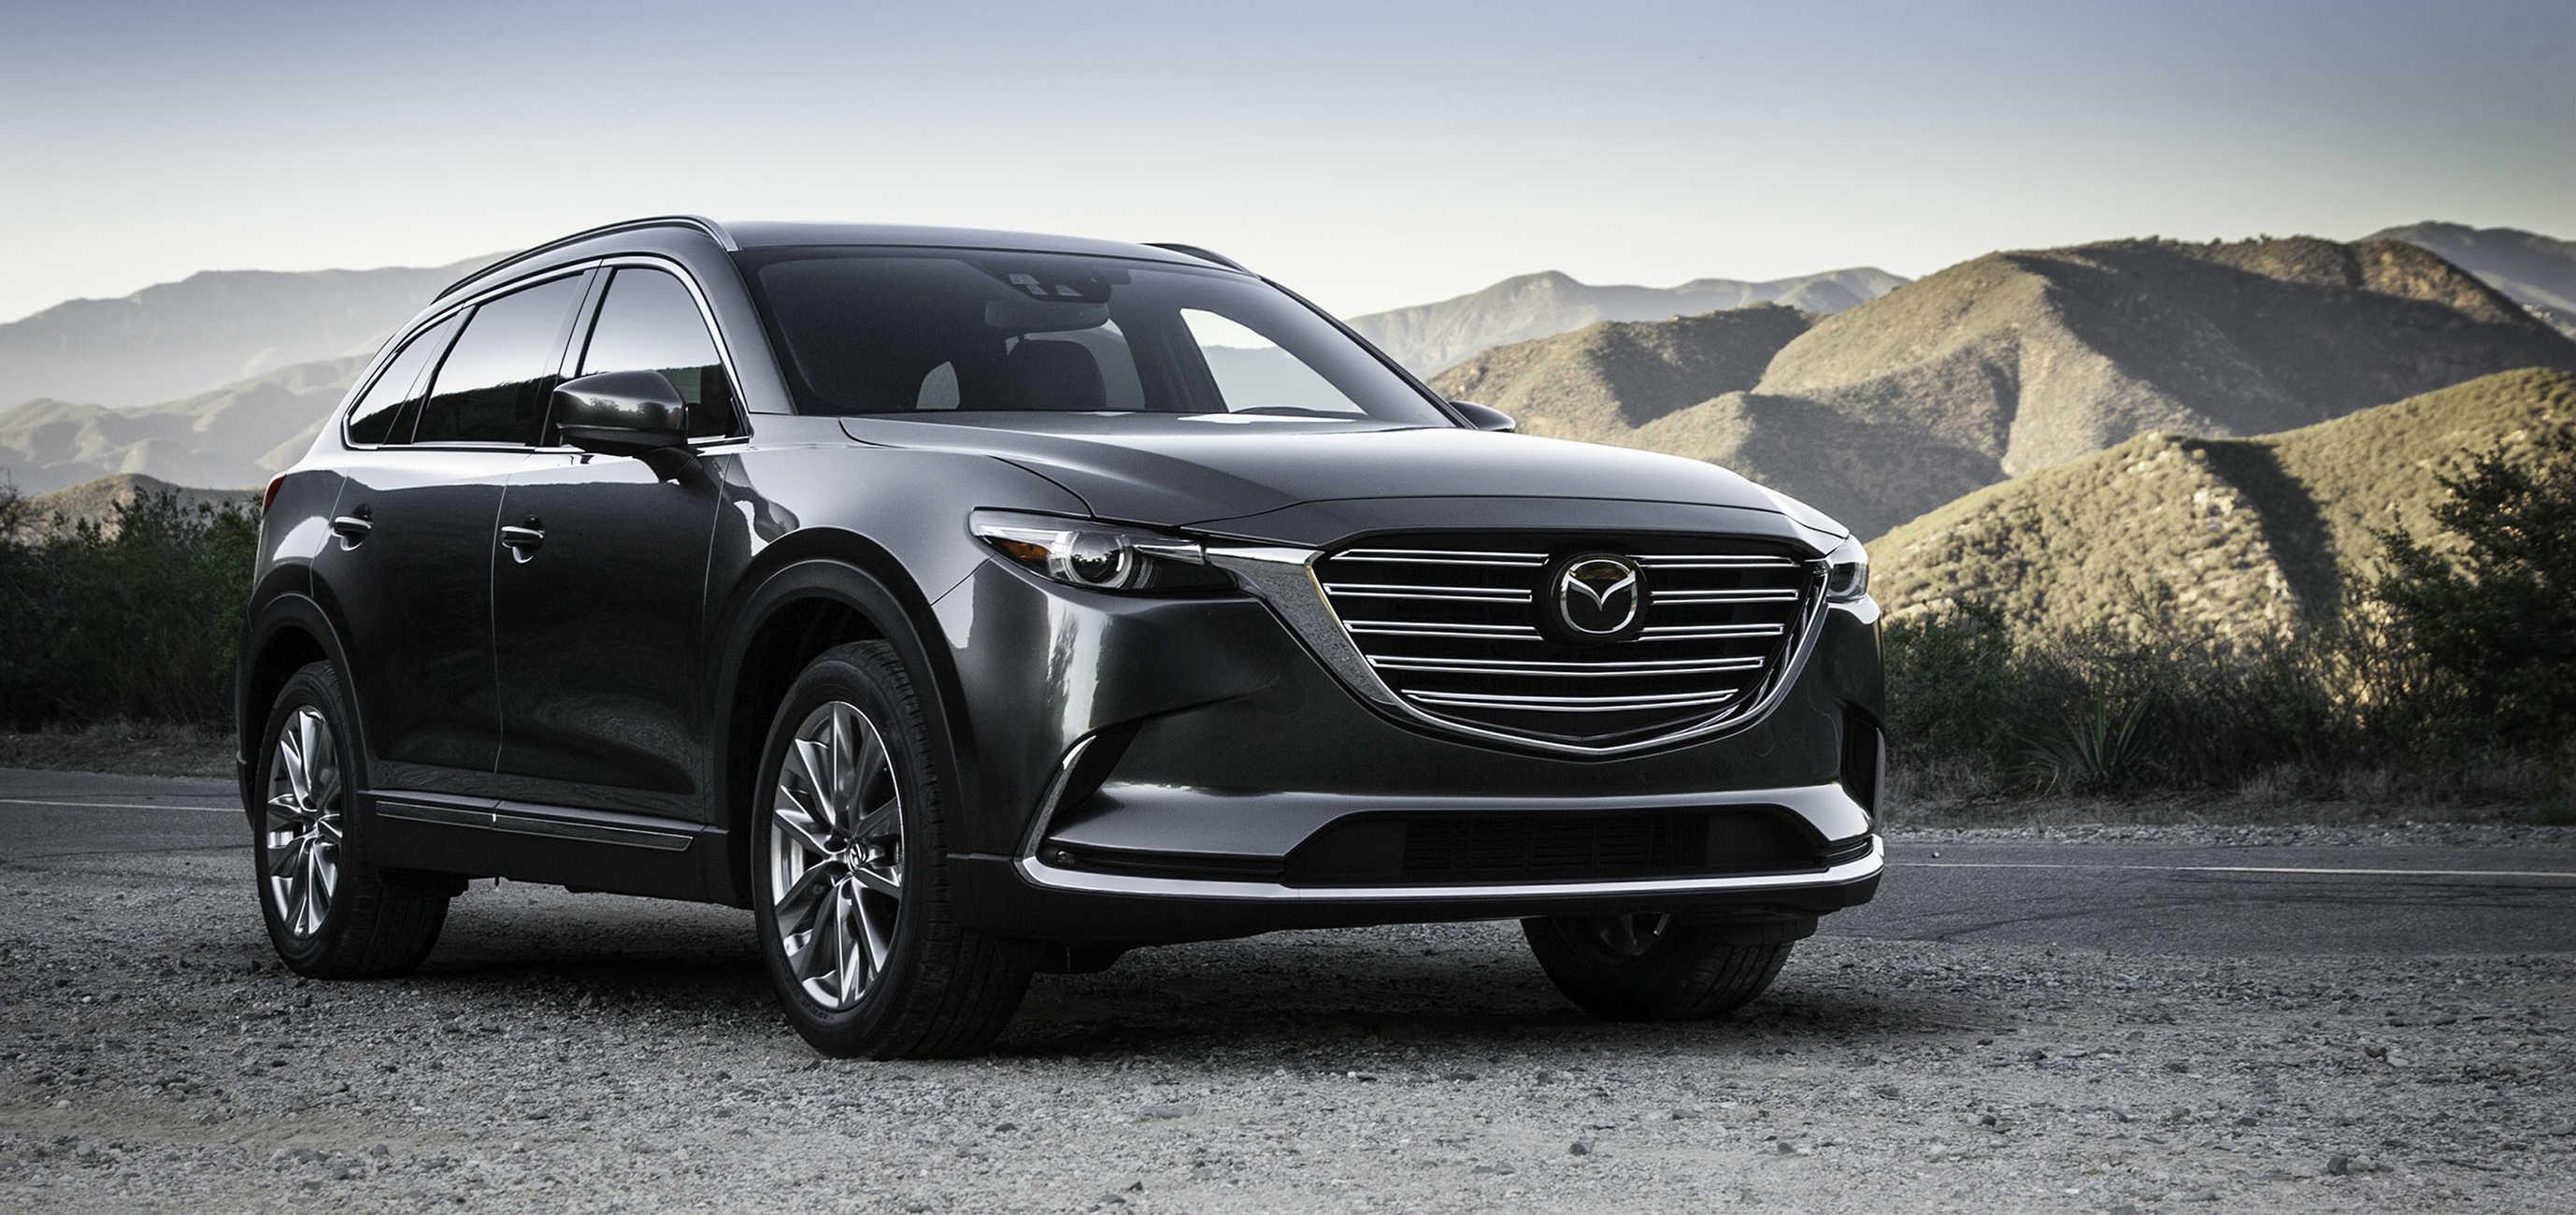 Mazda seven seater